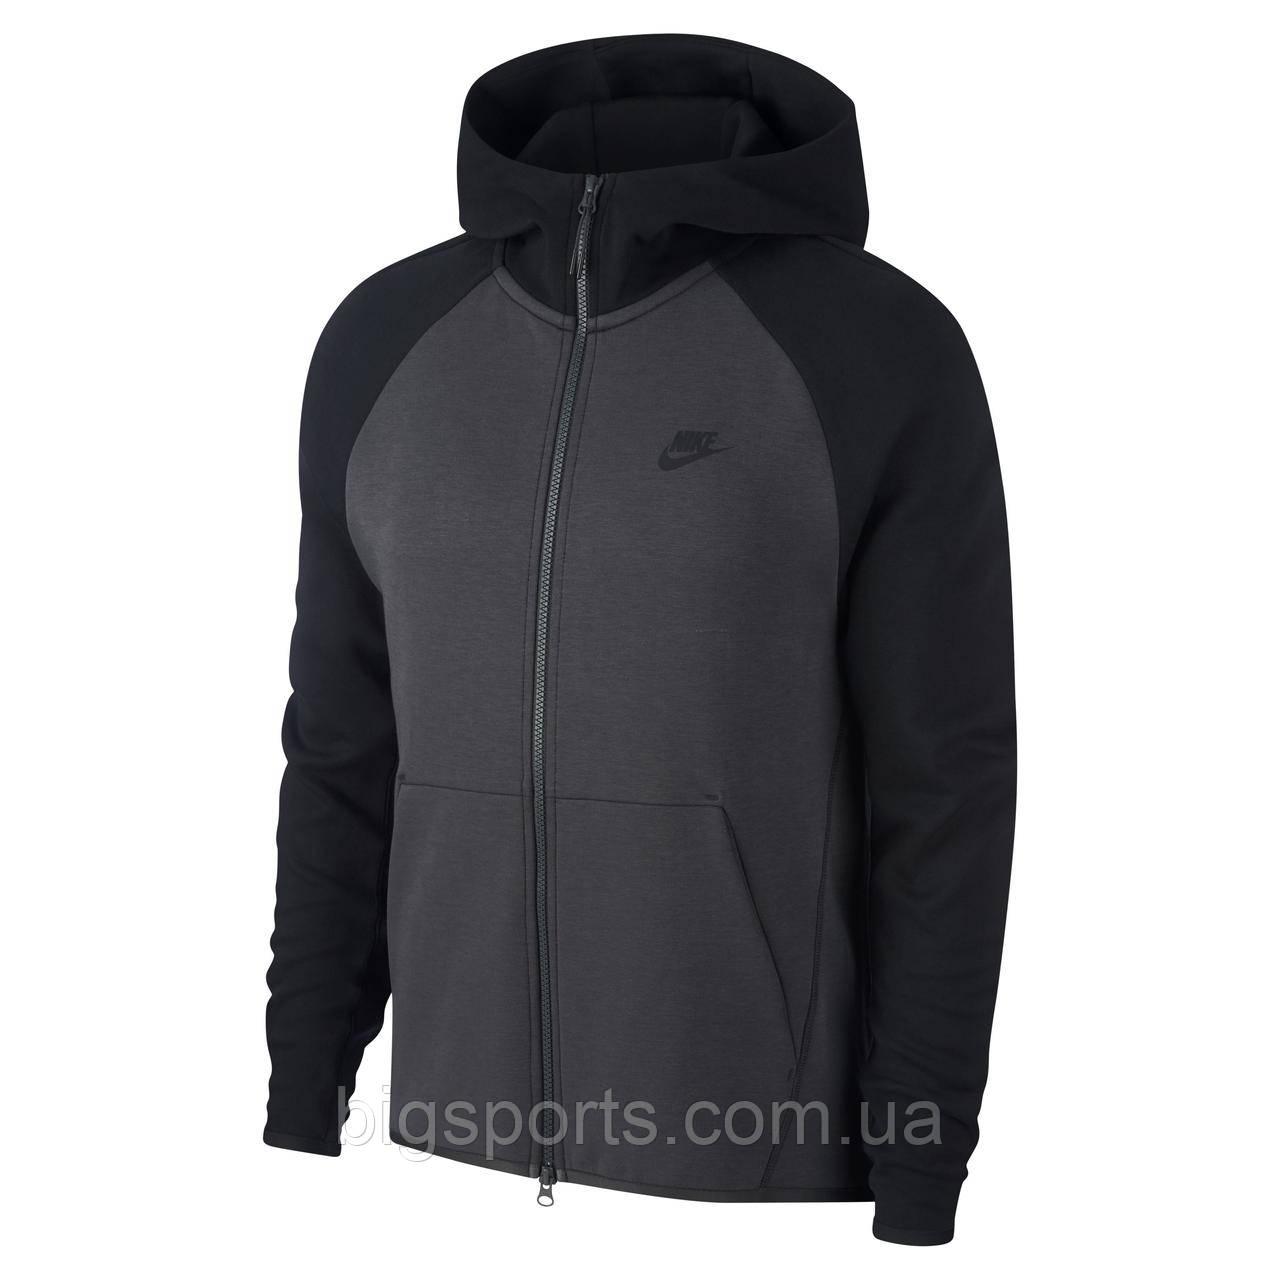 0a9b3d35 Кофта муж. Nike M Nsw Tch Flc Hoodie Fz (арт. 928483-060): продажа ...